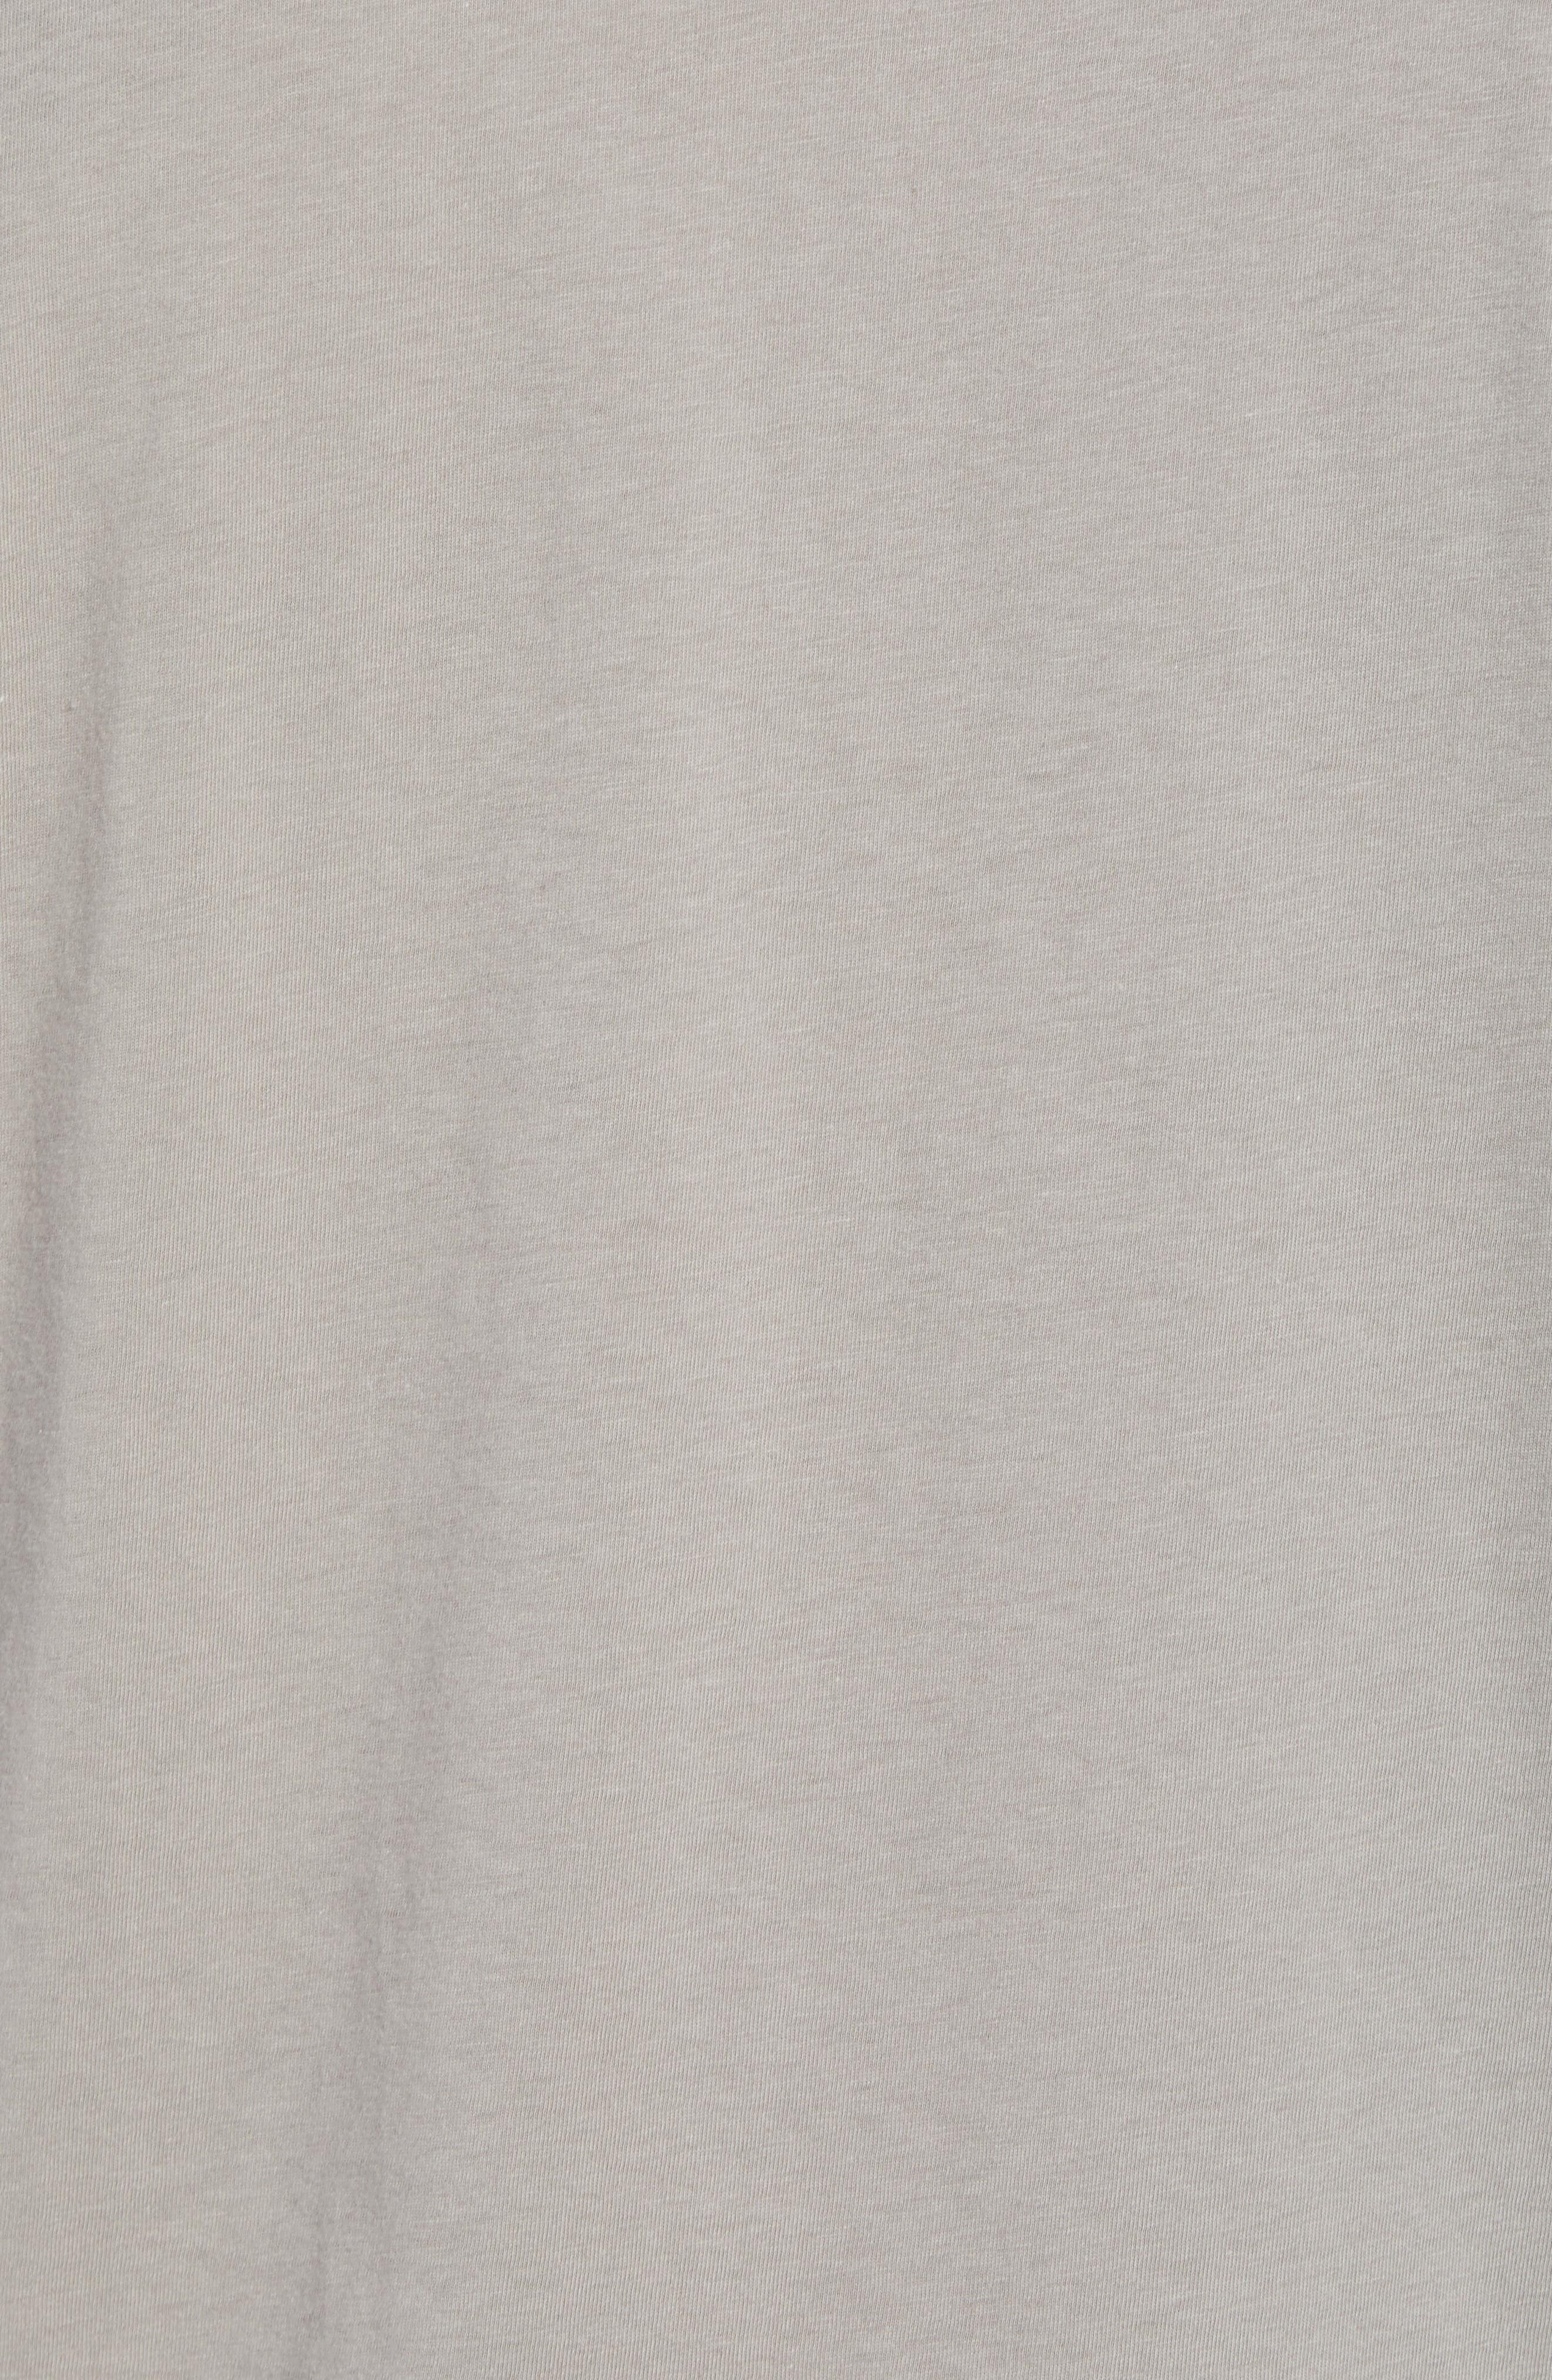 PATAGONIA, Fitz Roy Scope Crewneck T-Shirt, Alternate thumbnail 5, color, FEATHER GREY